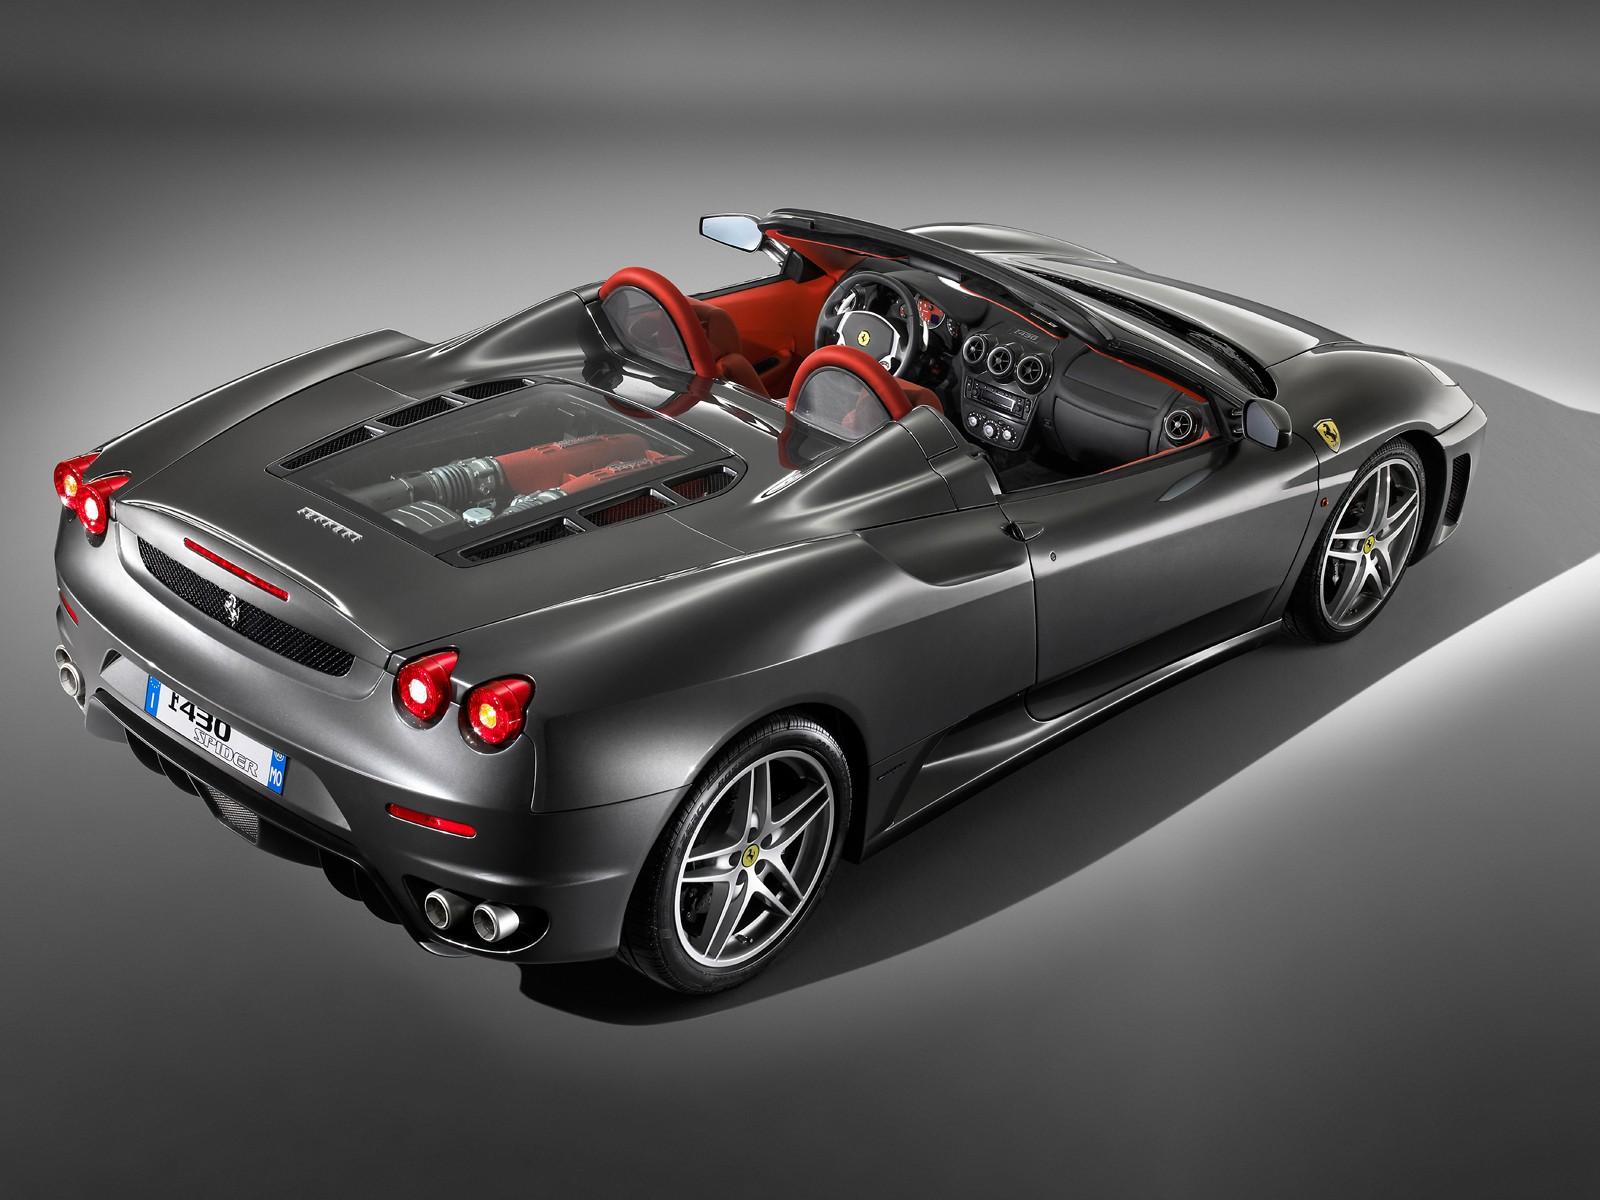 Best Wallpapers Ferrari F430 Wallpapers